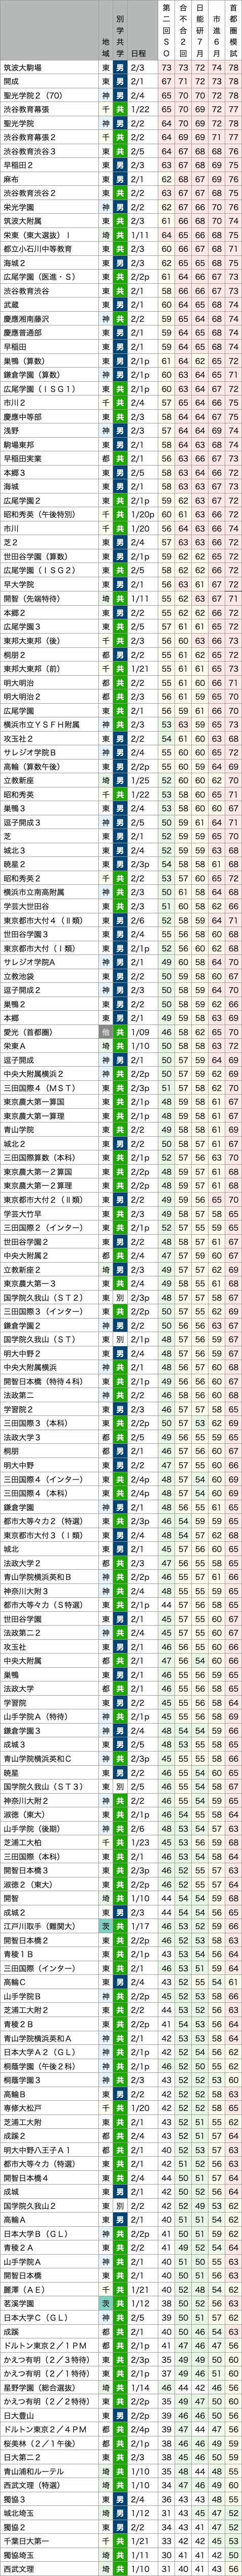 https://e-tutor.tokyo/data/20200821/01.png